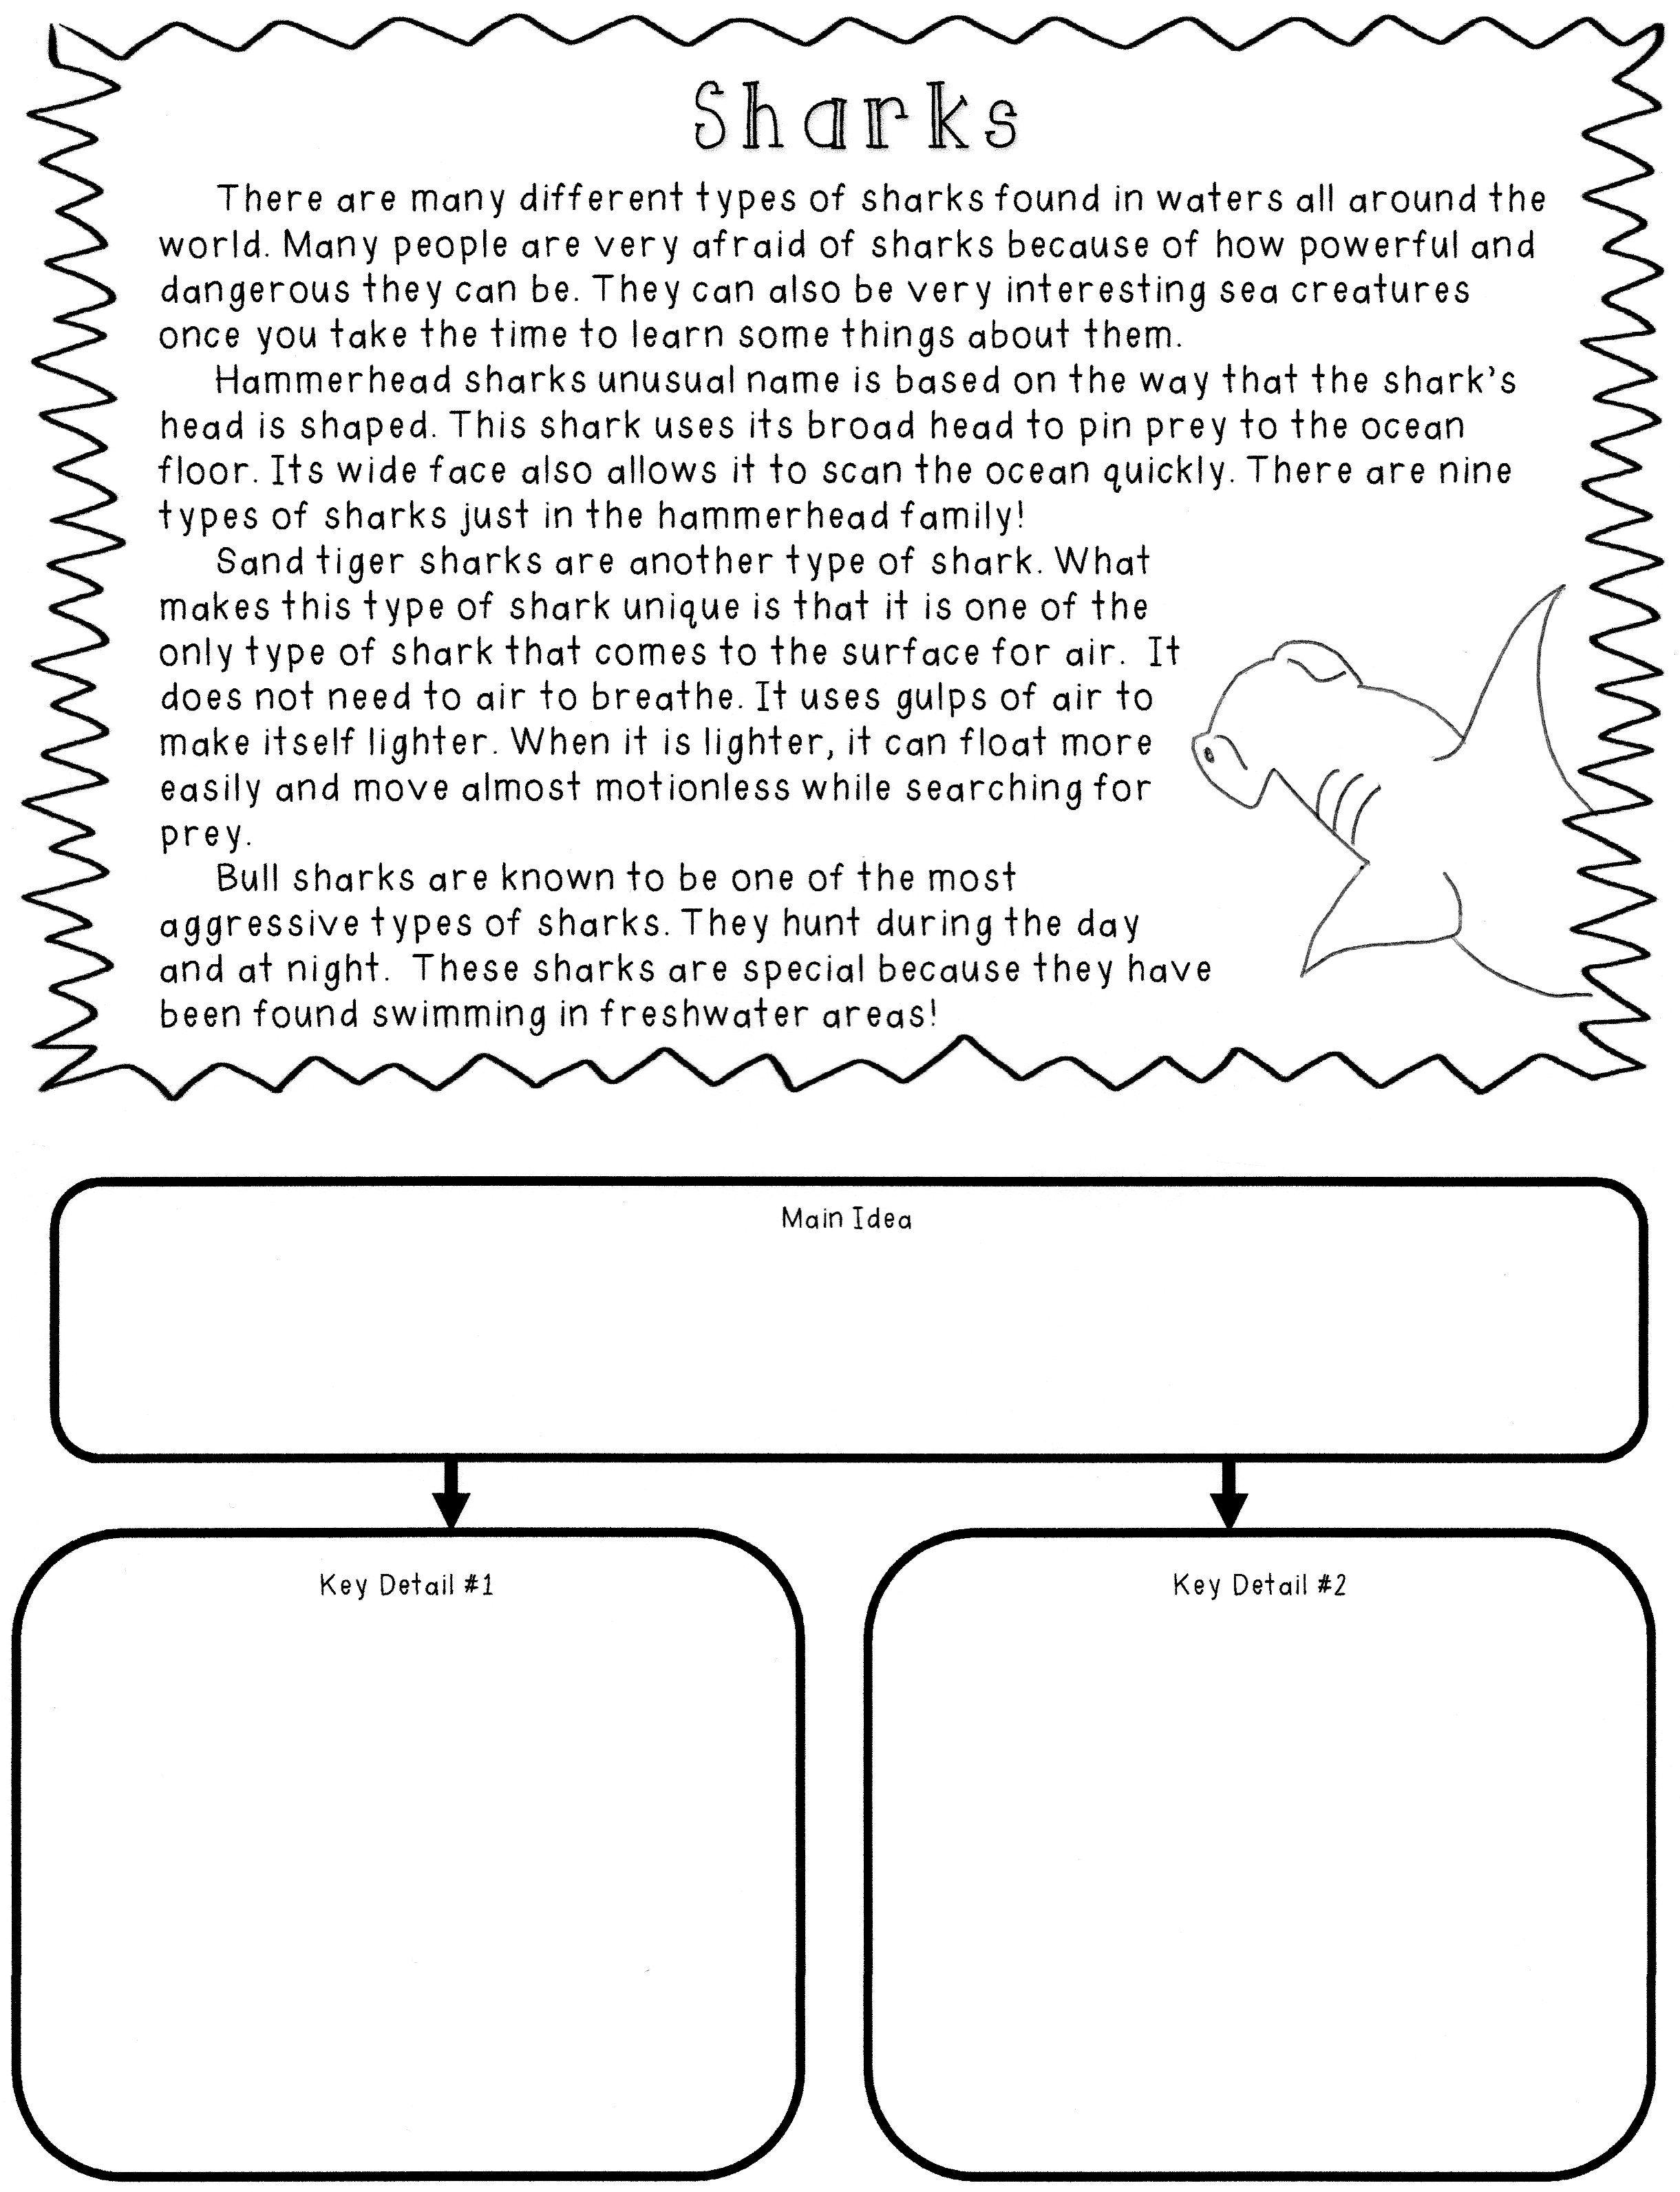 medium resolution of A great way to teach determining main idea and locating key details!!!    Main idea